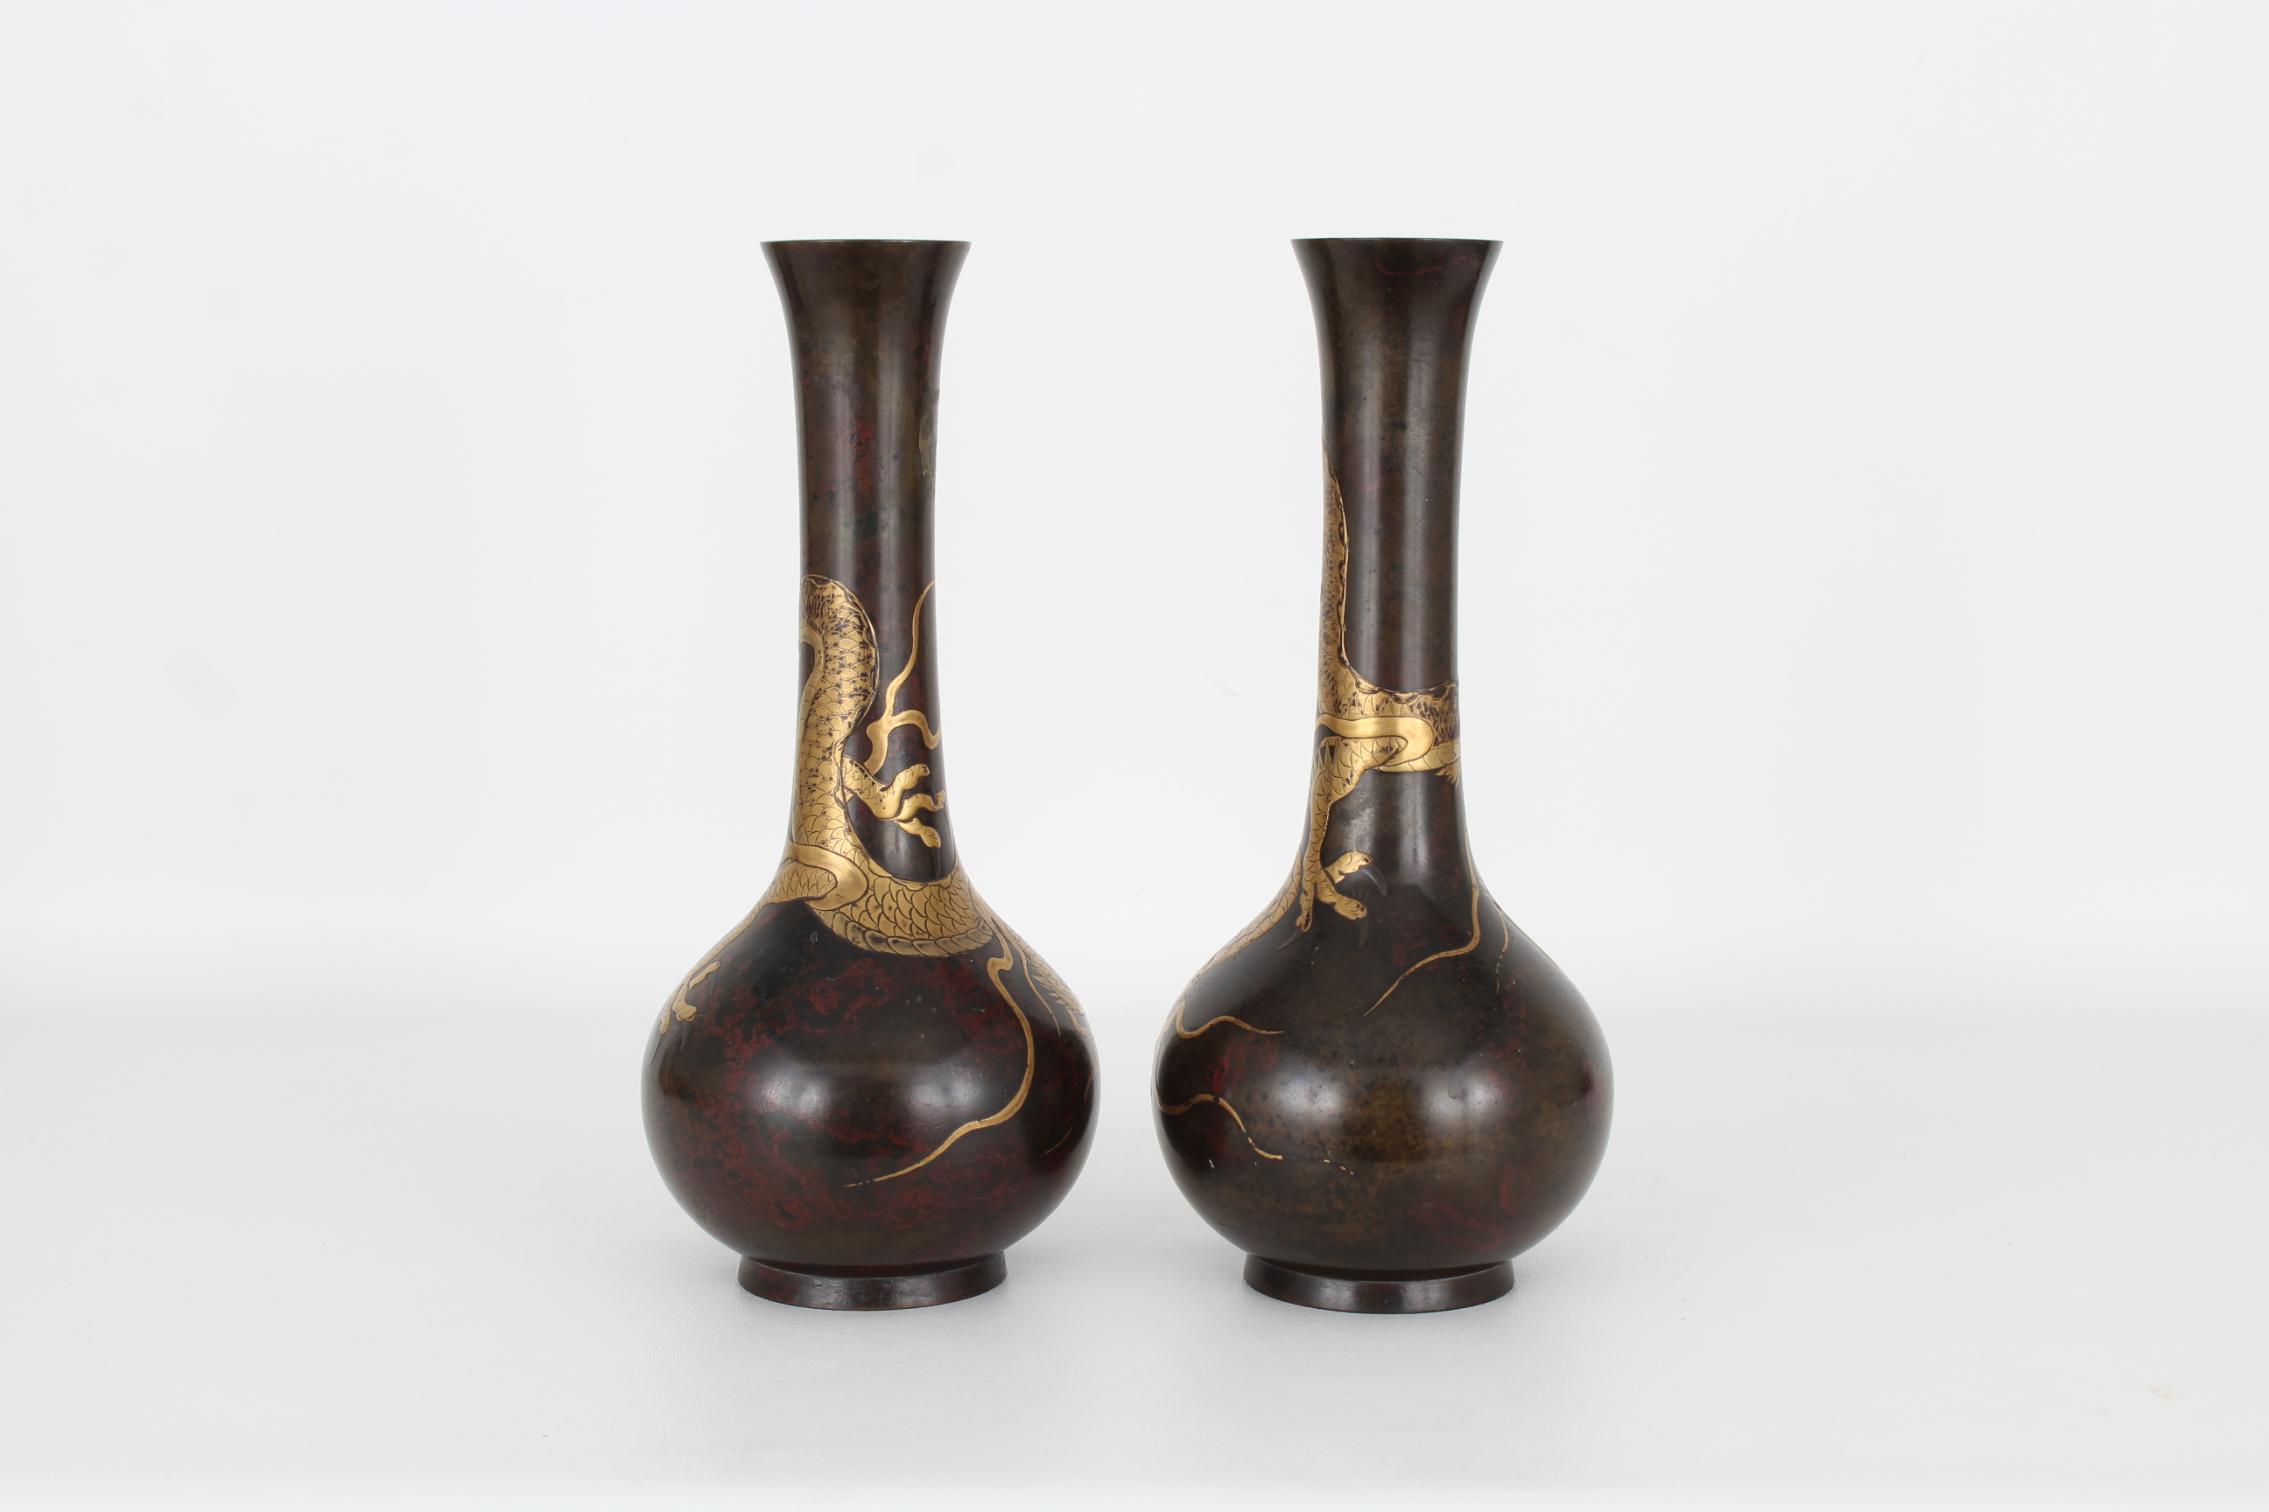 (2) Antique Bronze/Gold Japanese Dragon Vases - Image 4 of 7